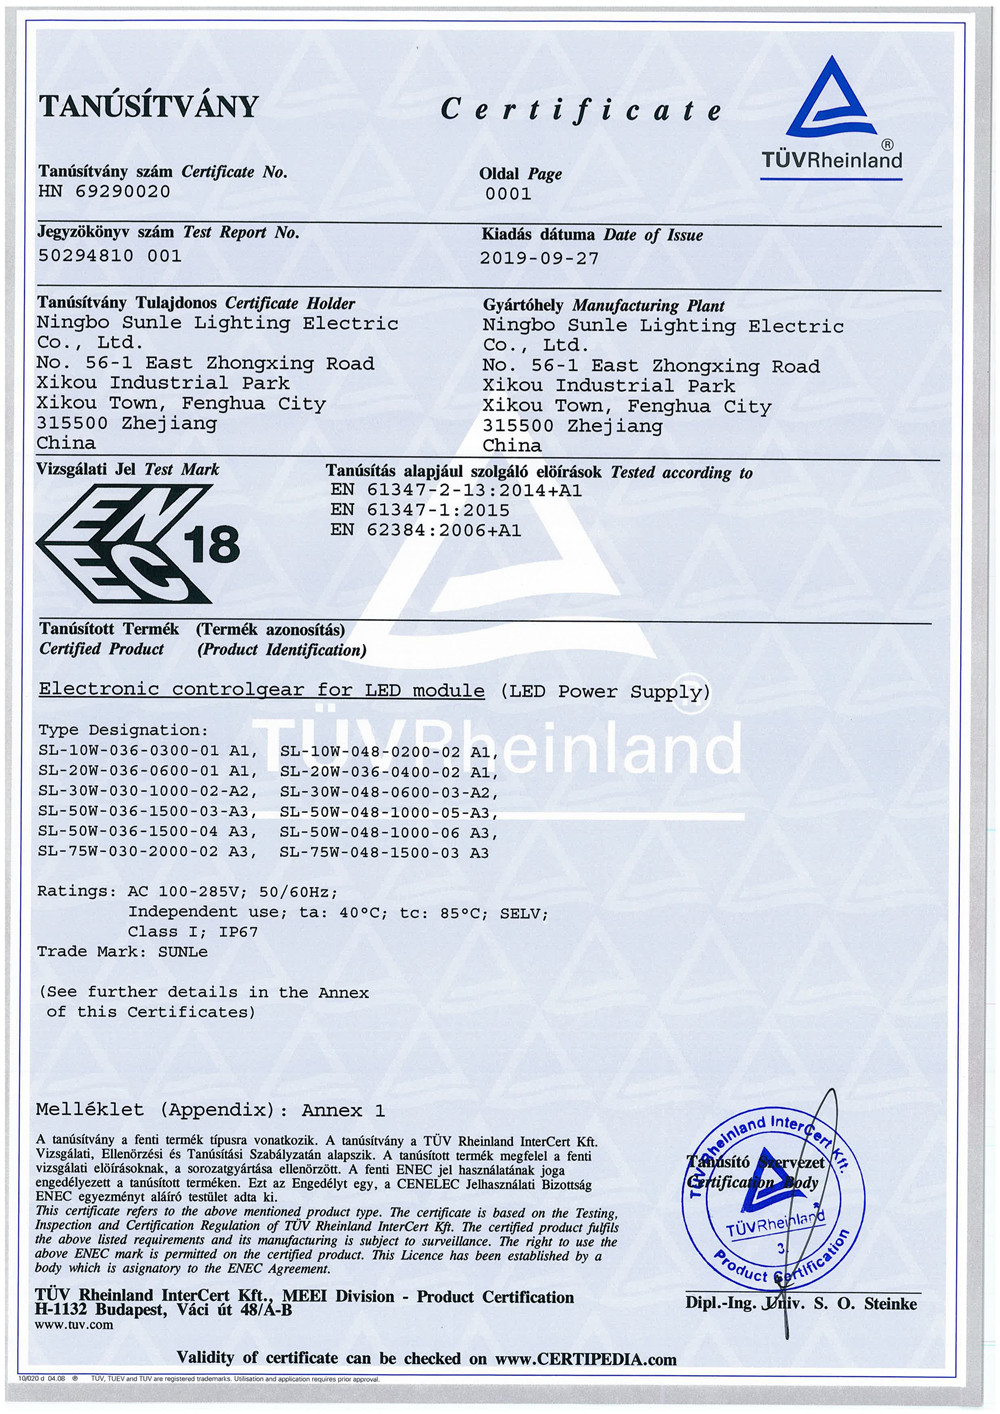 LED Driver ENEC Certificate - HN69290020